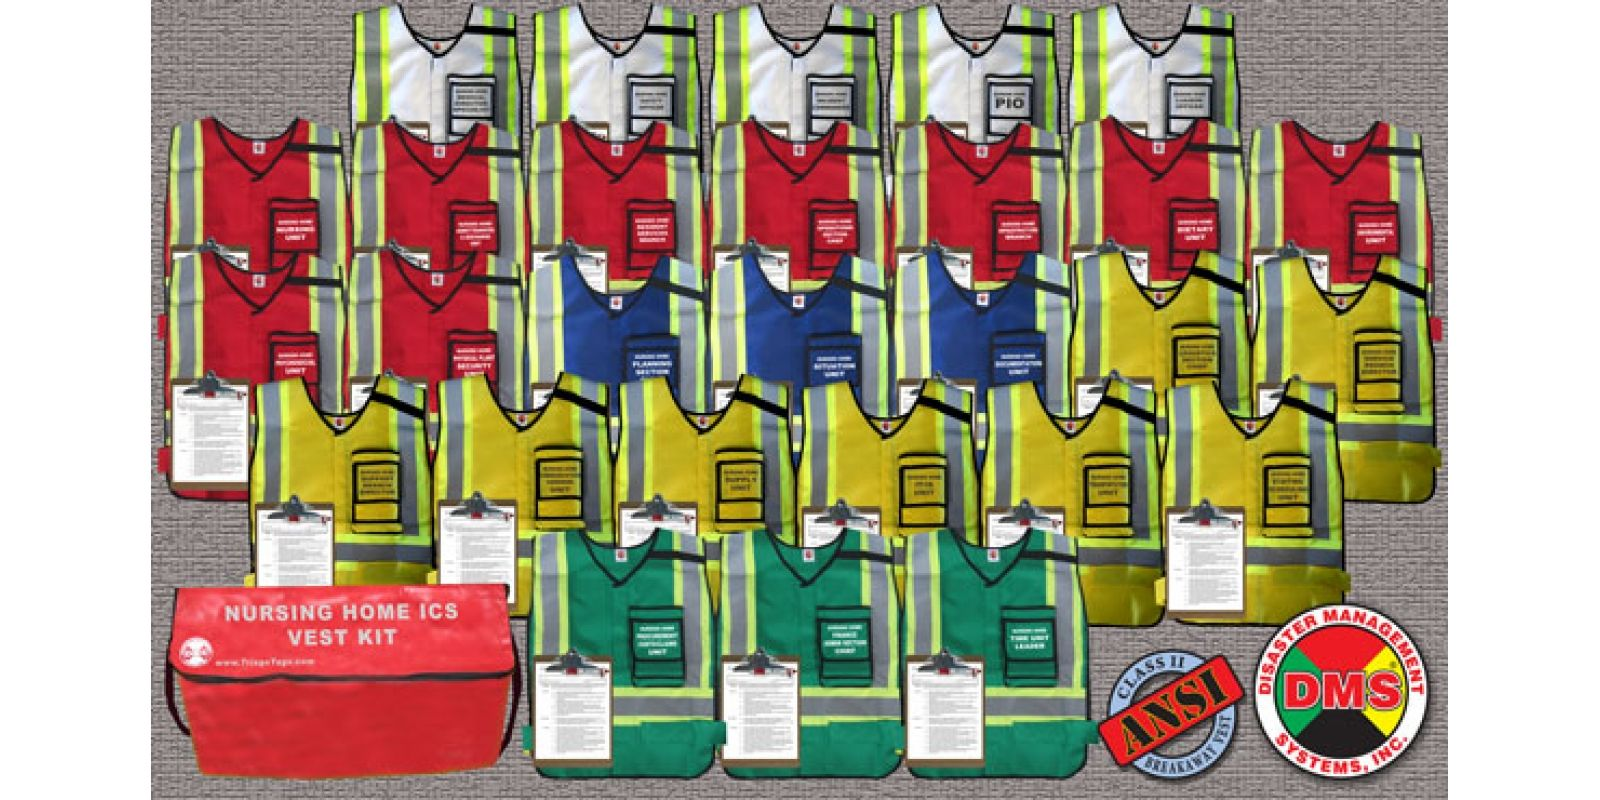 Dms05850 nursing home ics nhics command vest kit 28